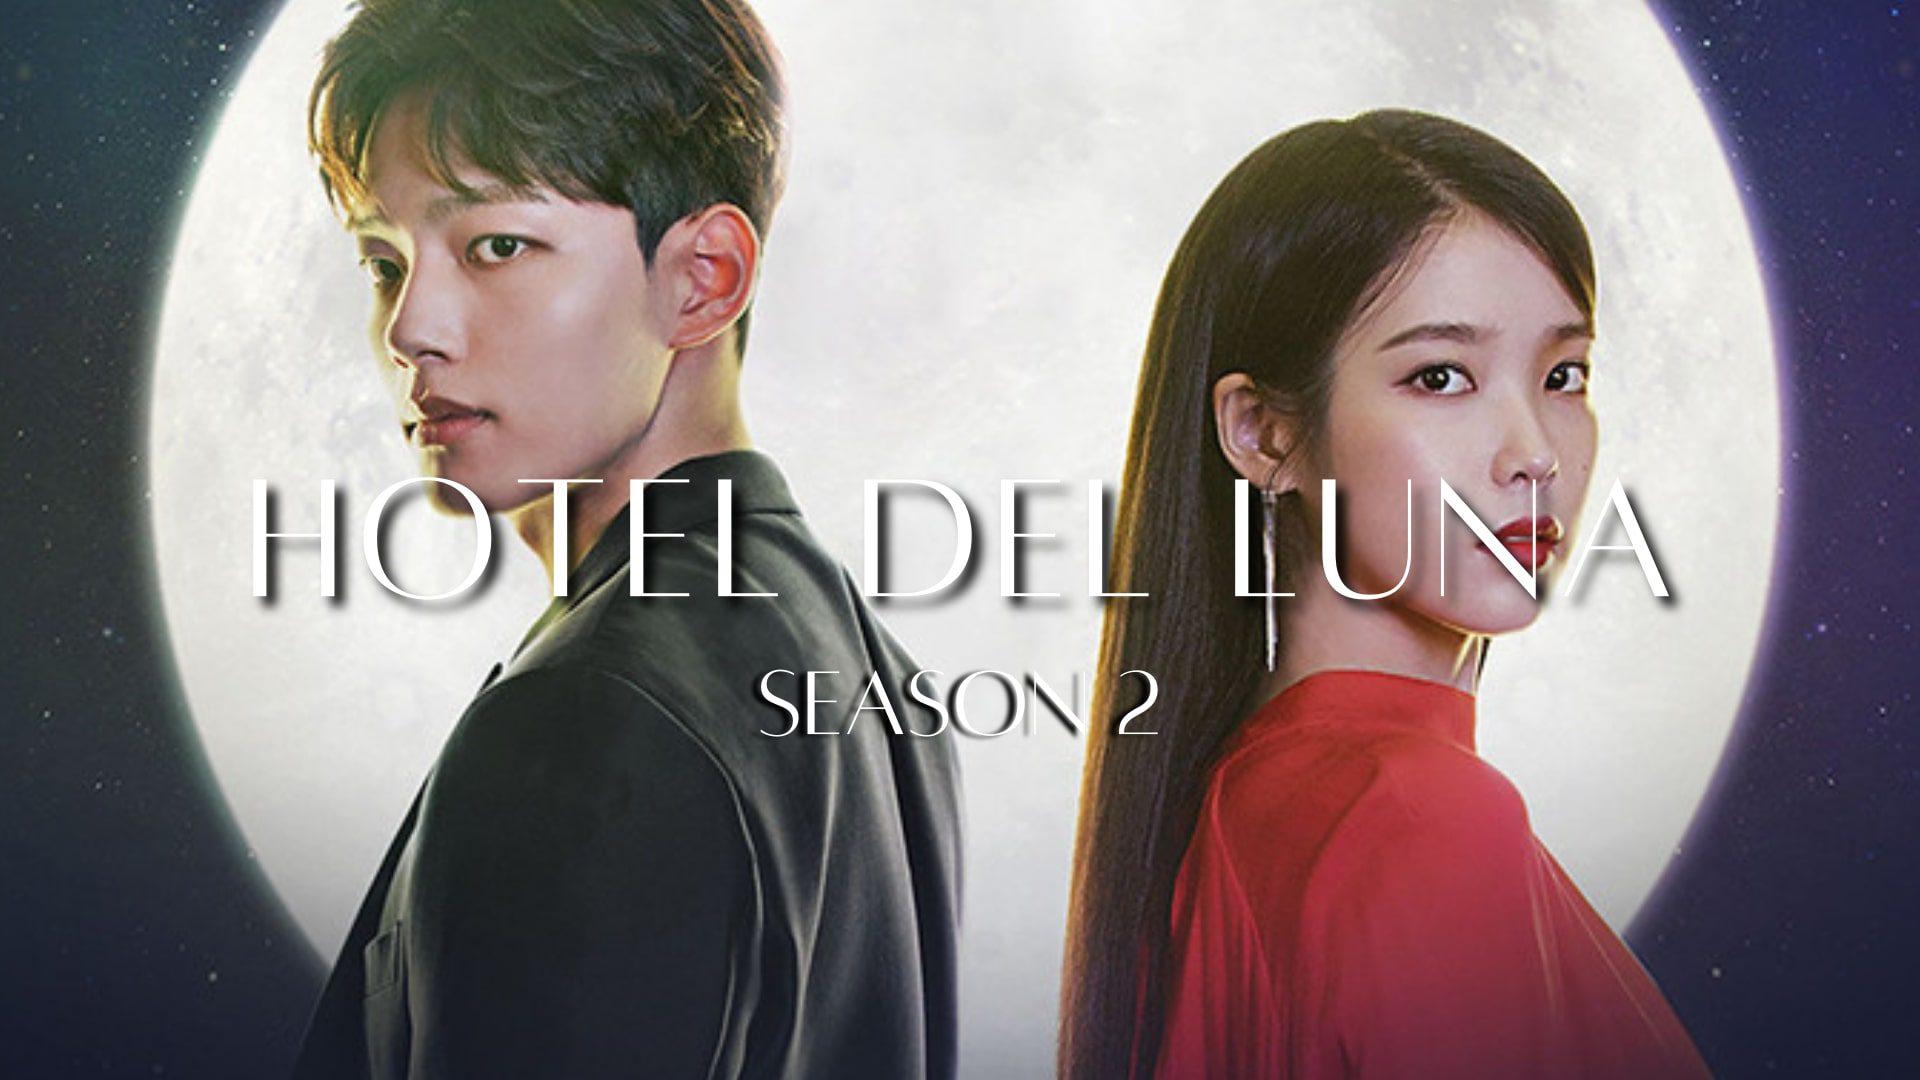 Hotel Del Luna Season 2: Release Date, Cast, & All Updates To Know